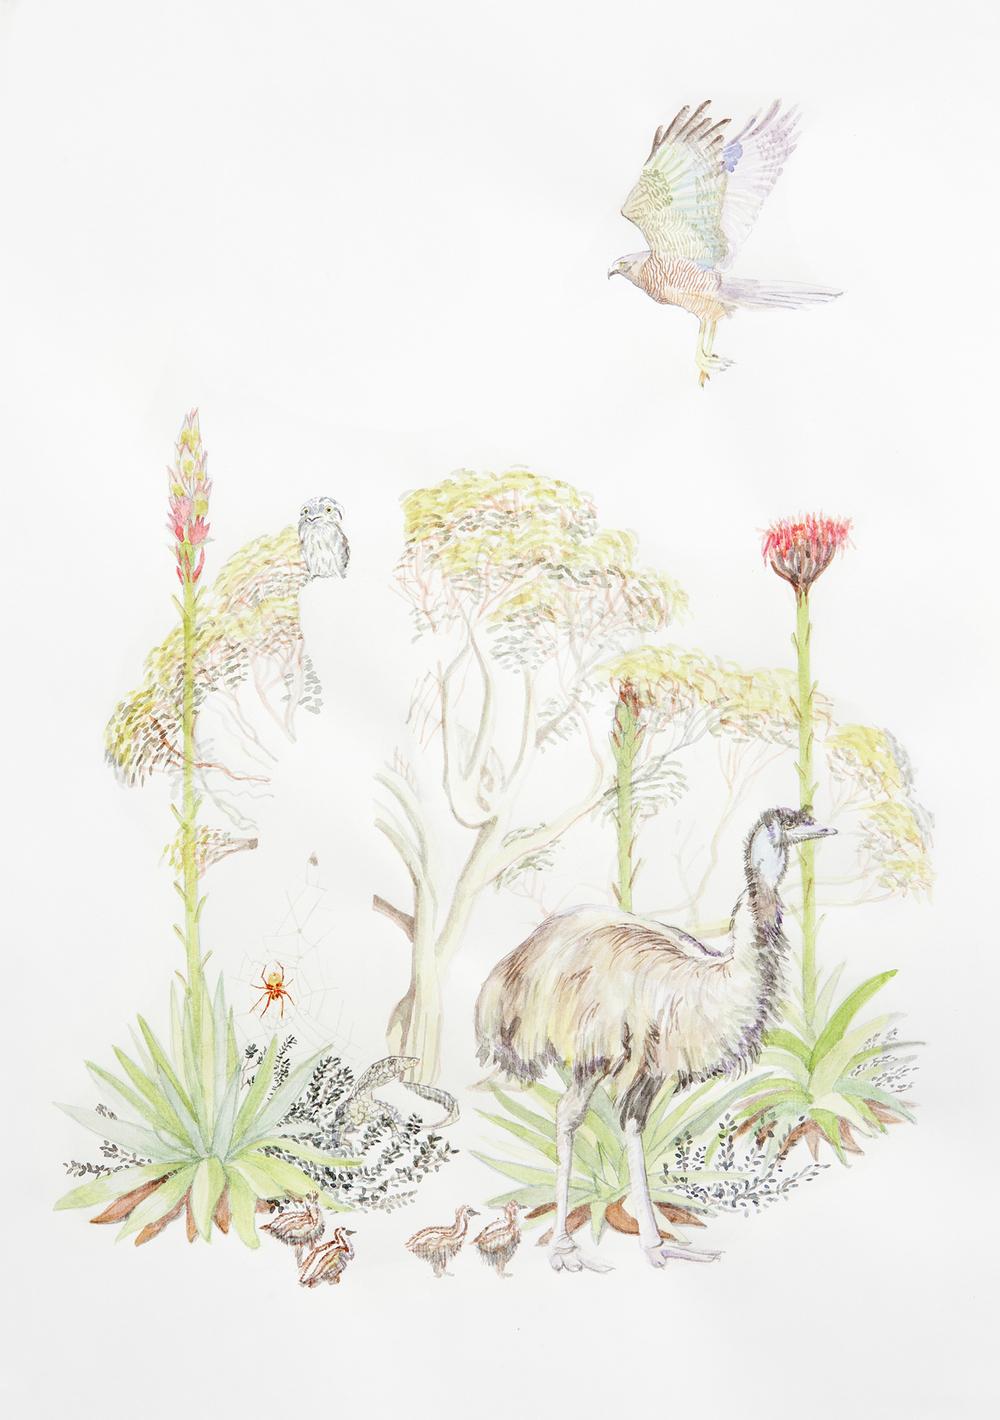 Australian at Heart? #2, 2011, Watercolour on paper, 21.0 x 29.5 cm, Photo: Sam Scoufos